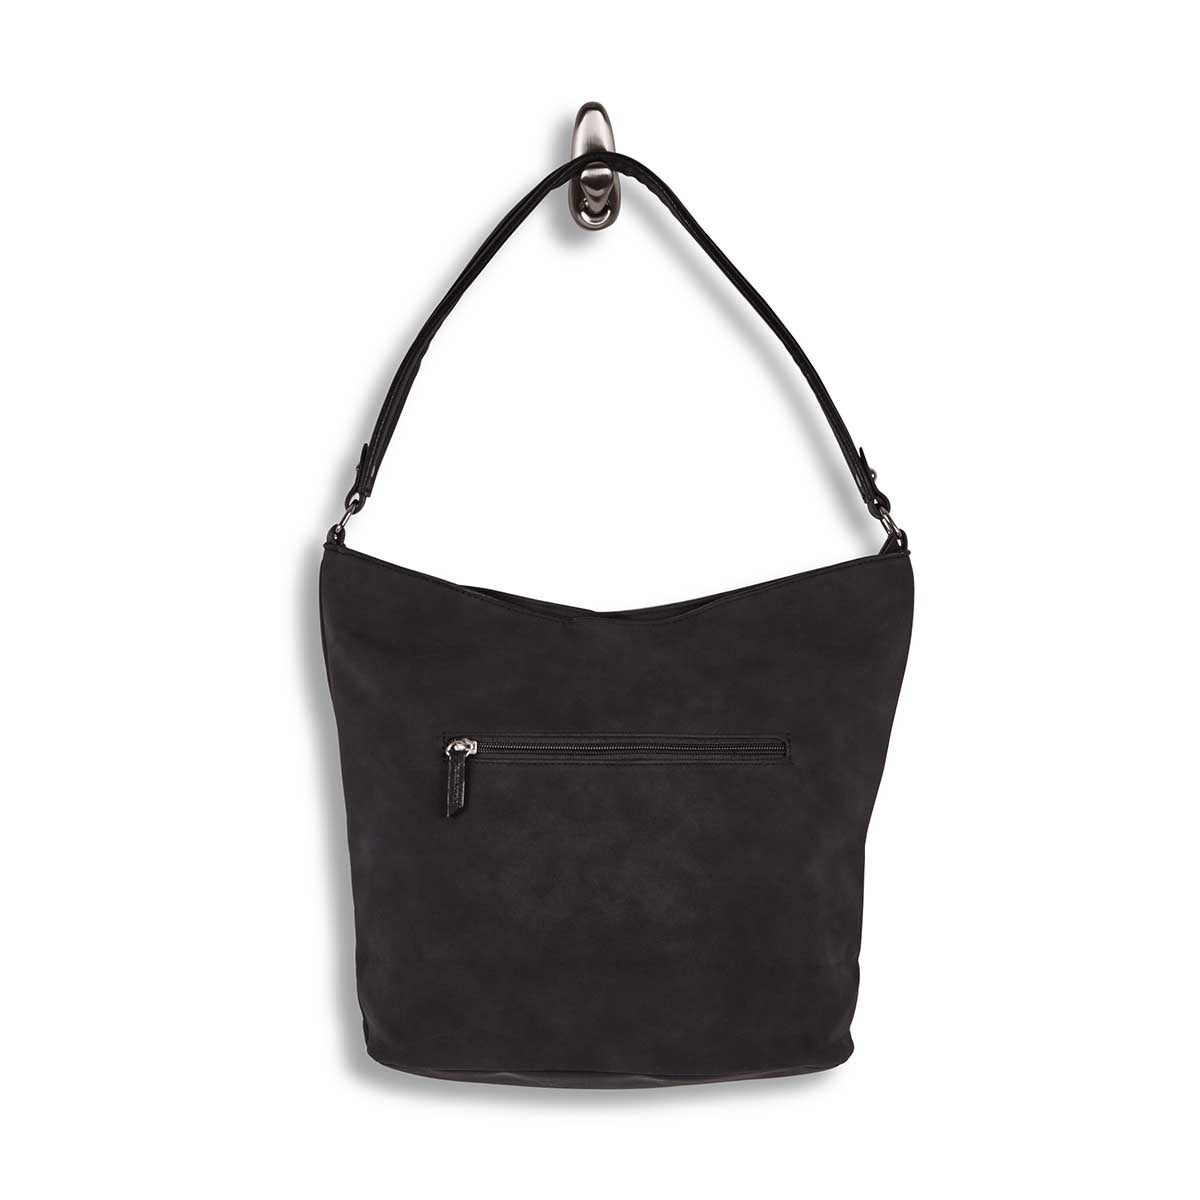 Lds black top zip closure hobo bag